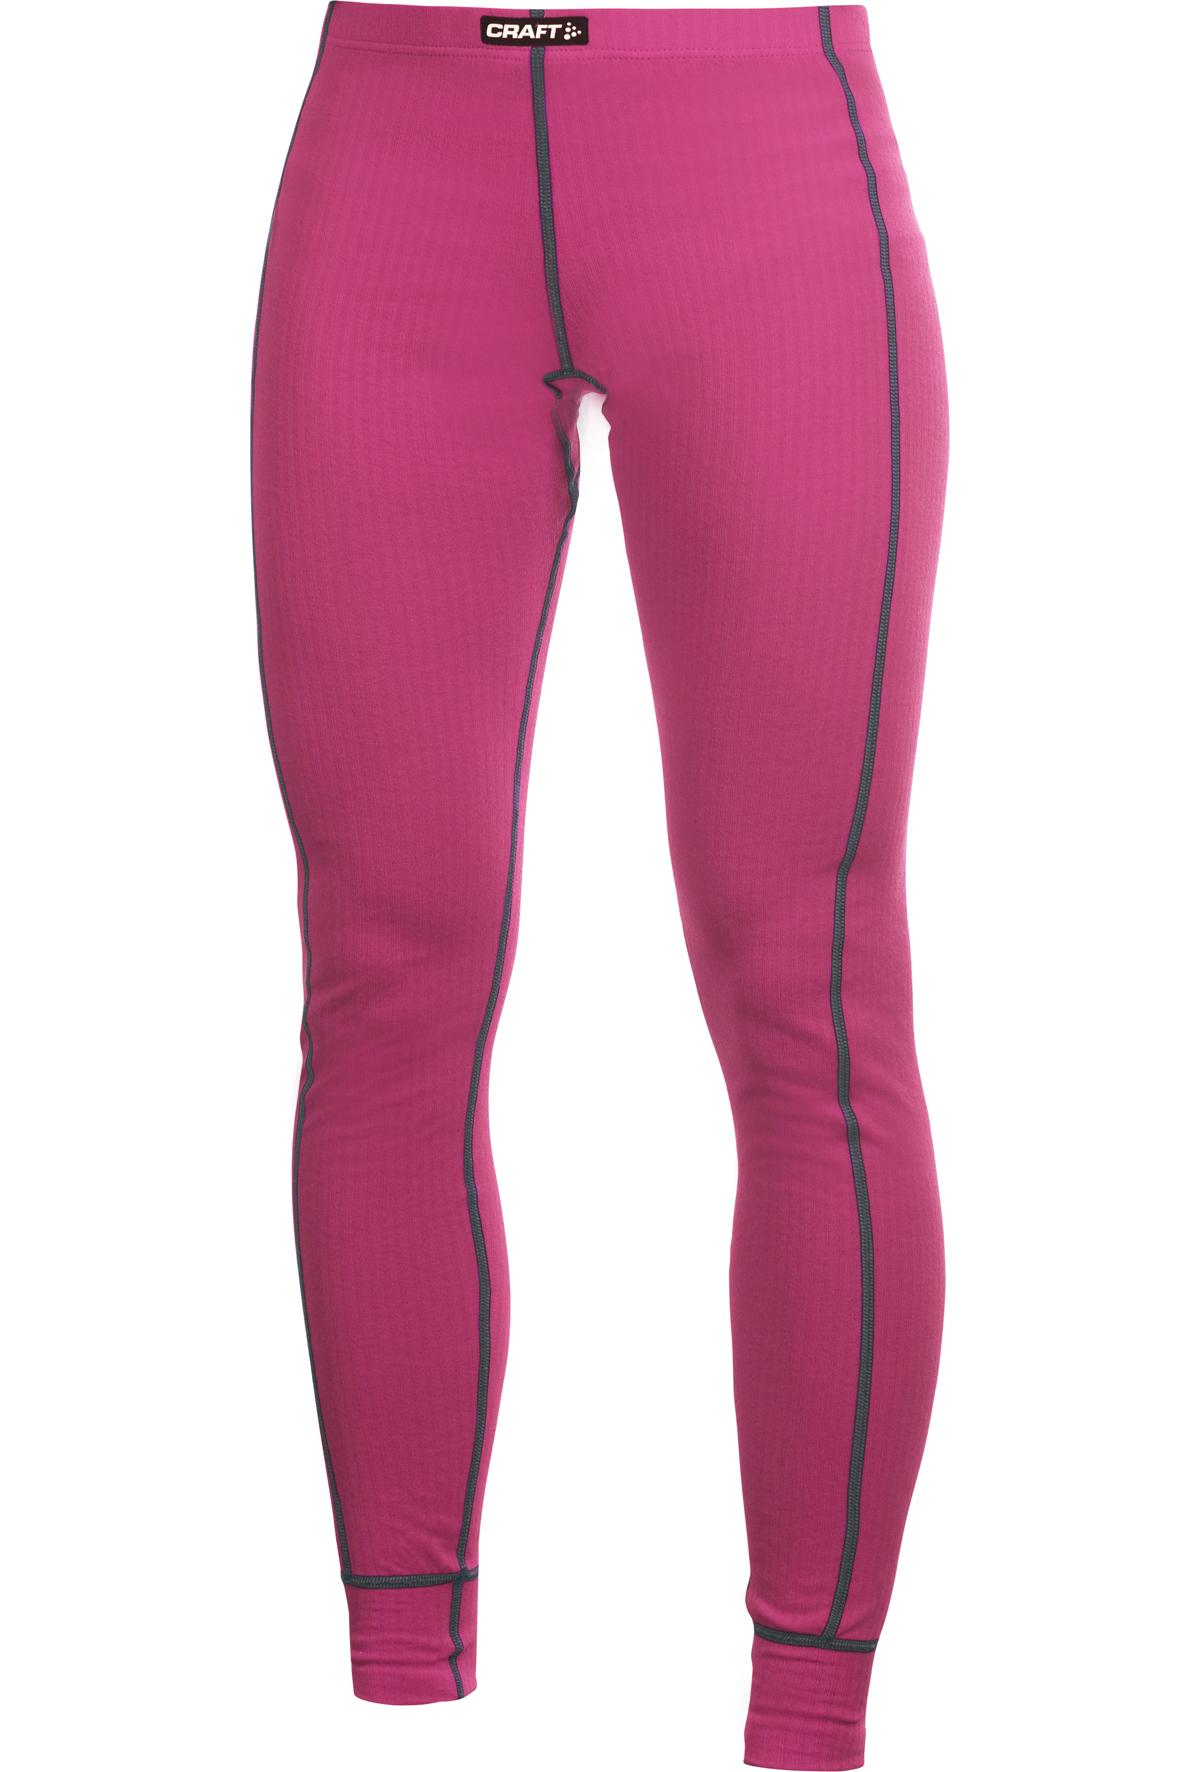 Термобелье Рейтузы Craft Active женские pink